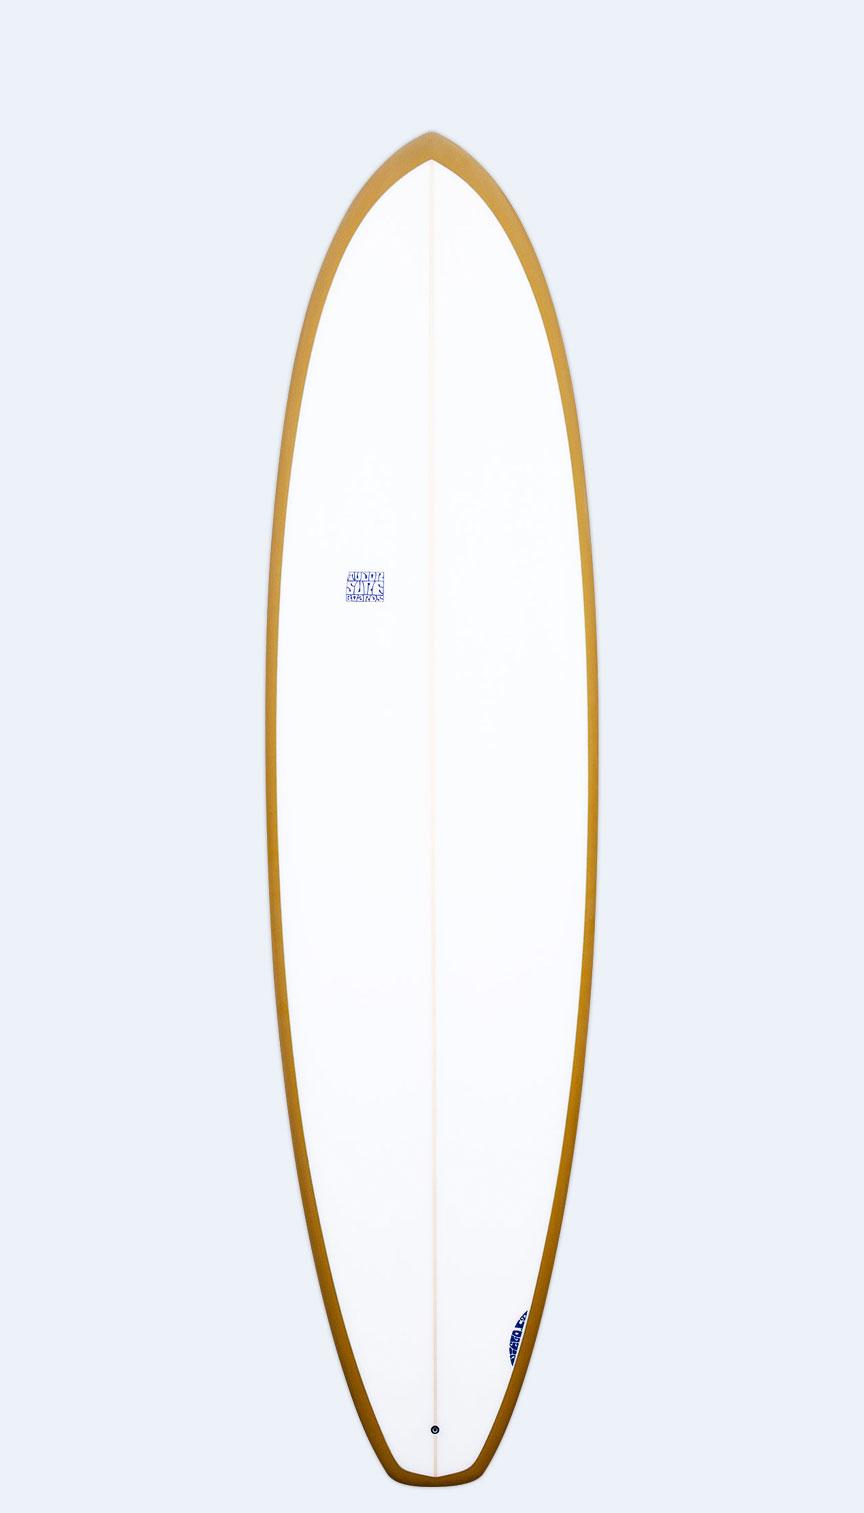 tudor-surfboards-dt-egg